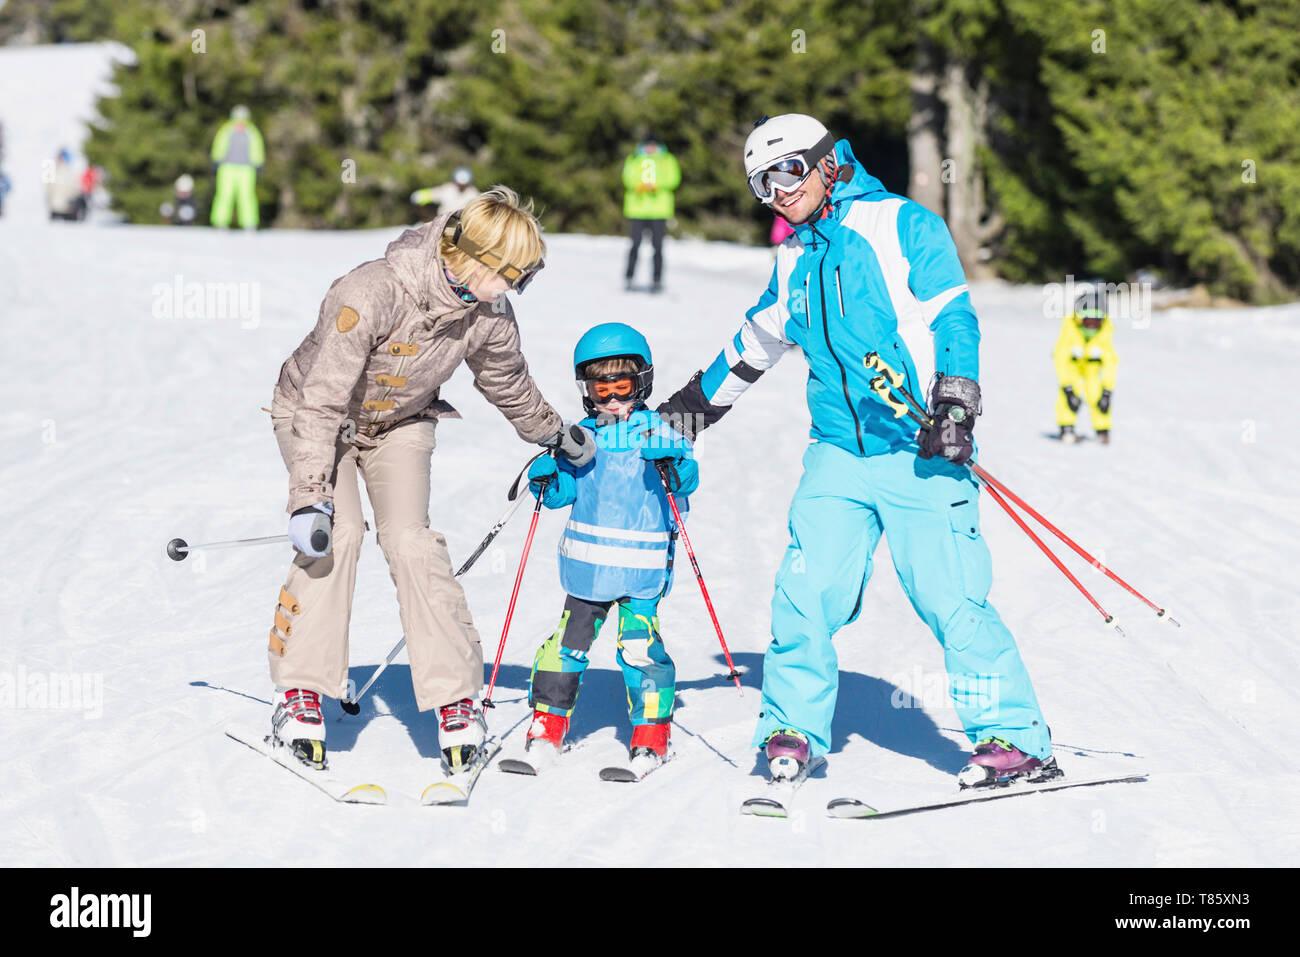 Family skiing - Stock Image